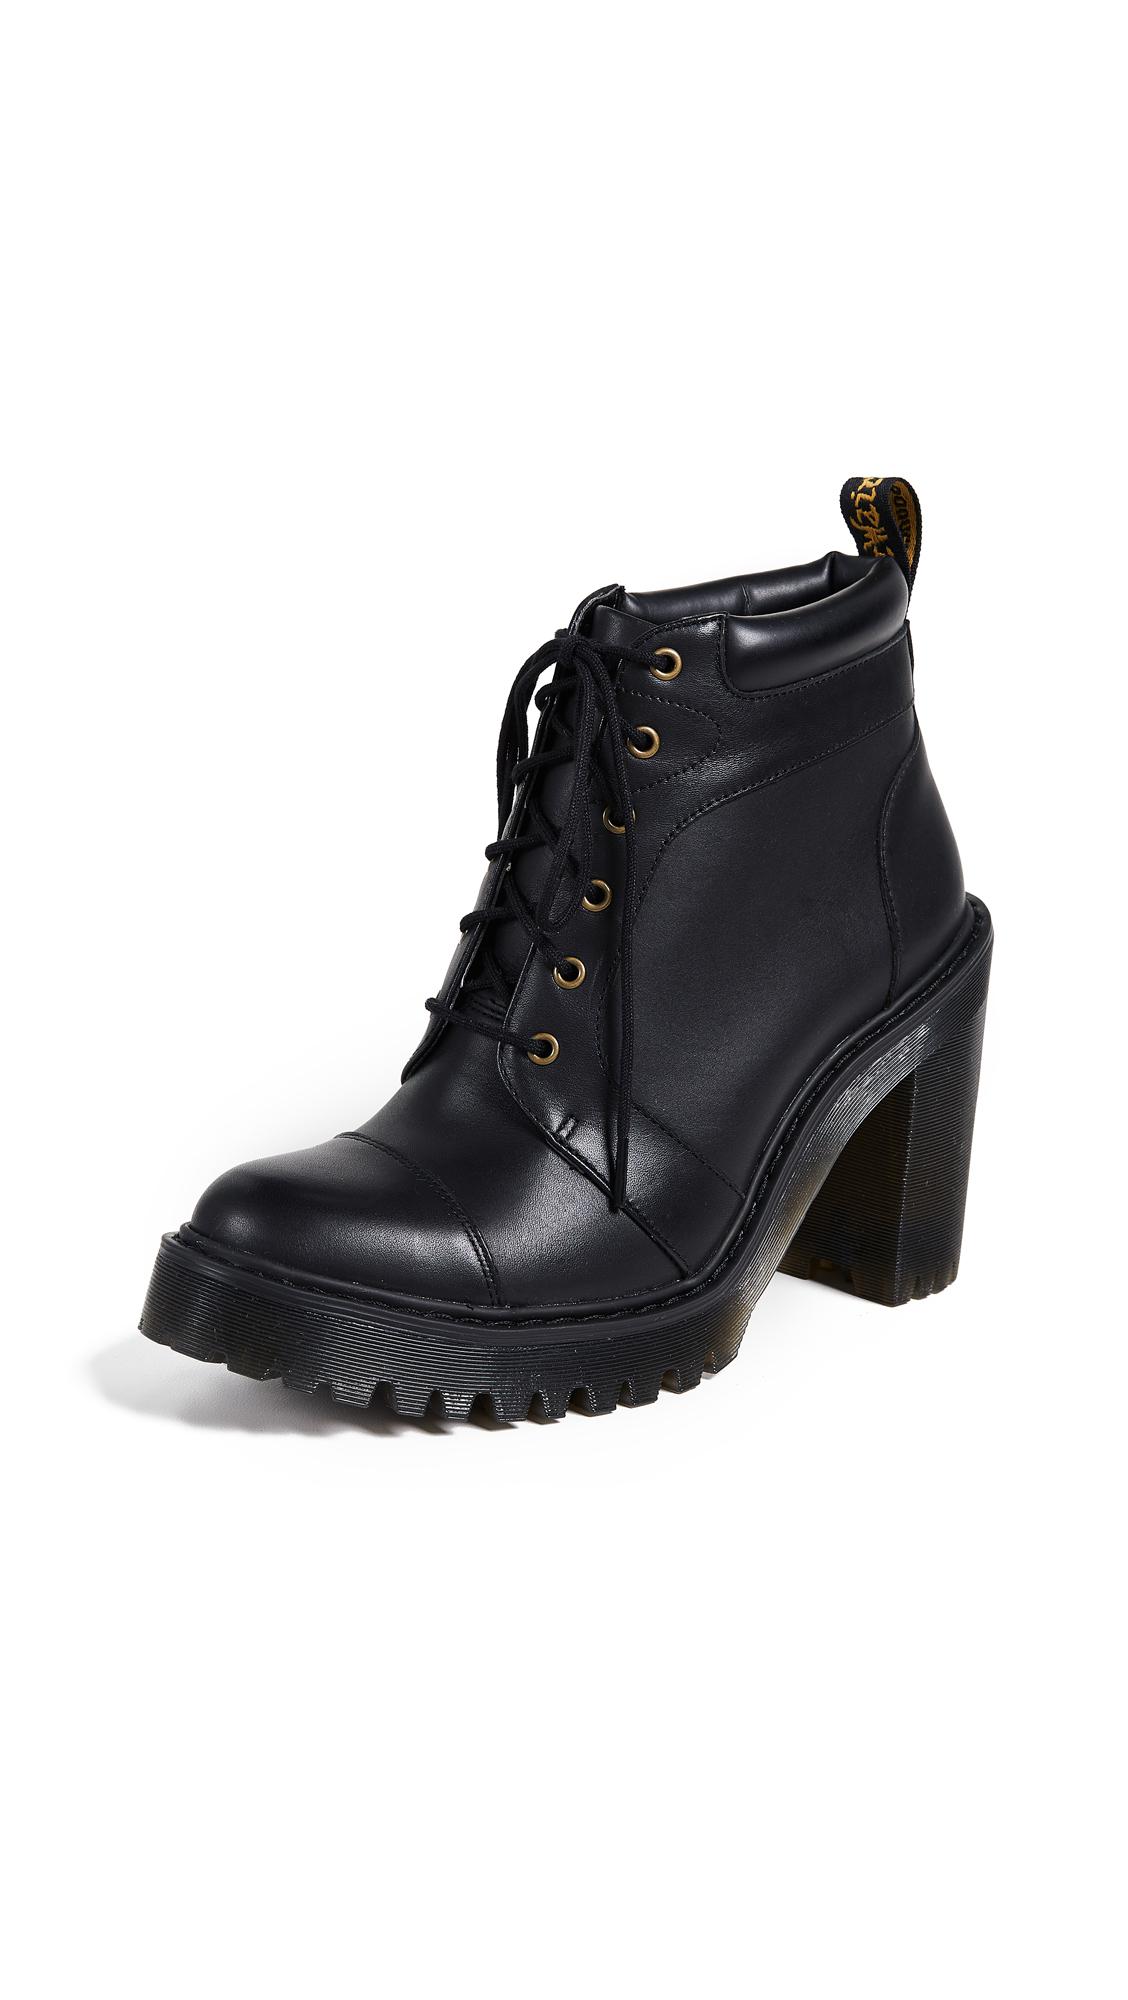 Dr. Martens Averil 6 Eye Boots - Black